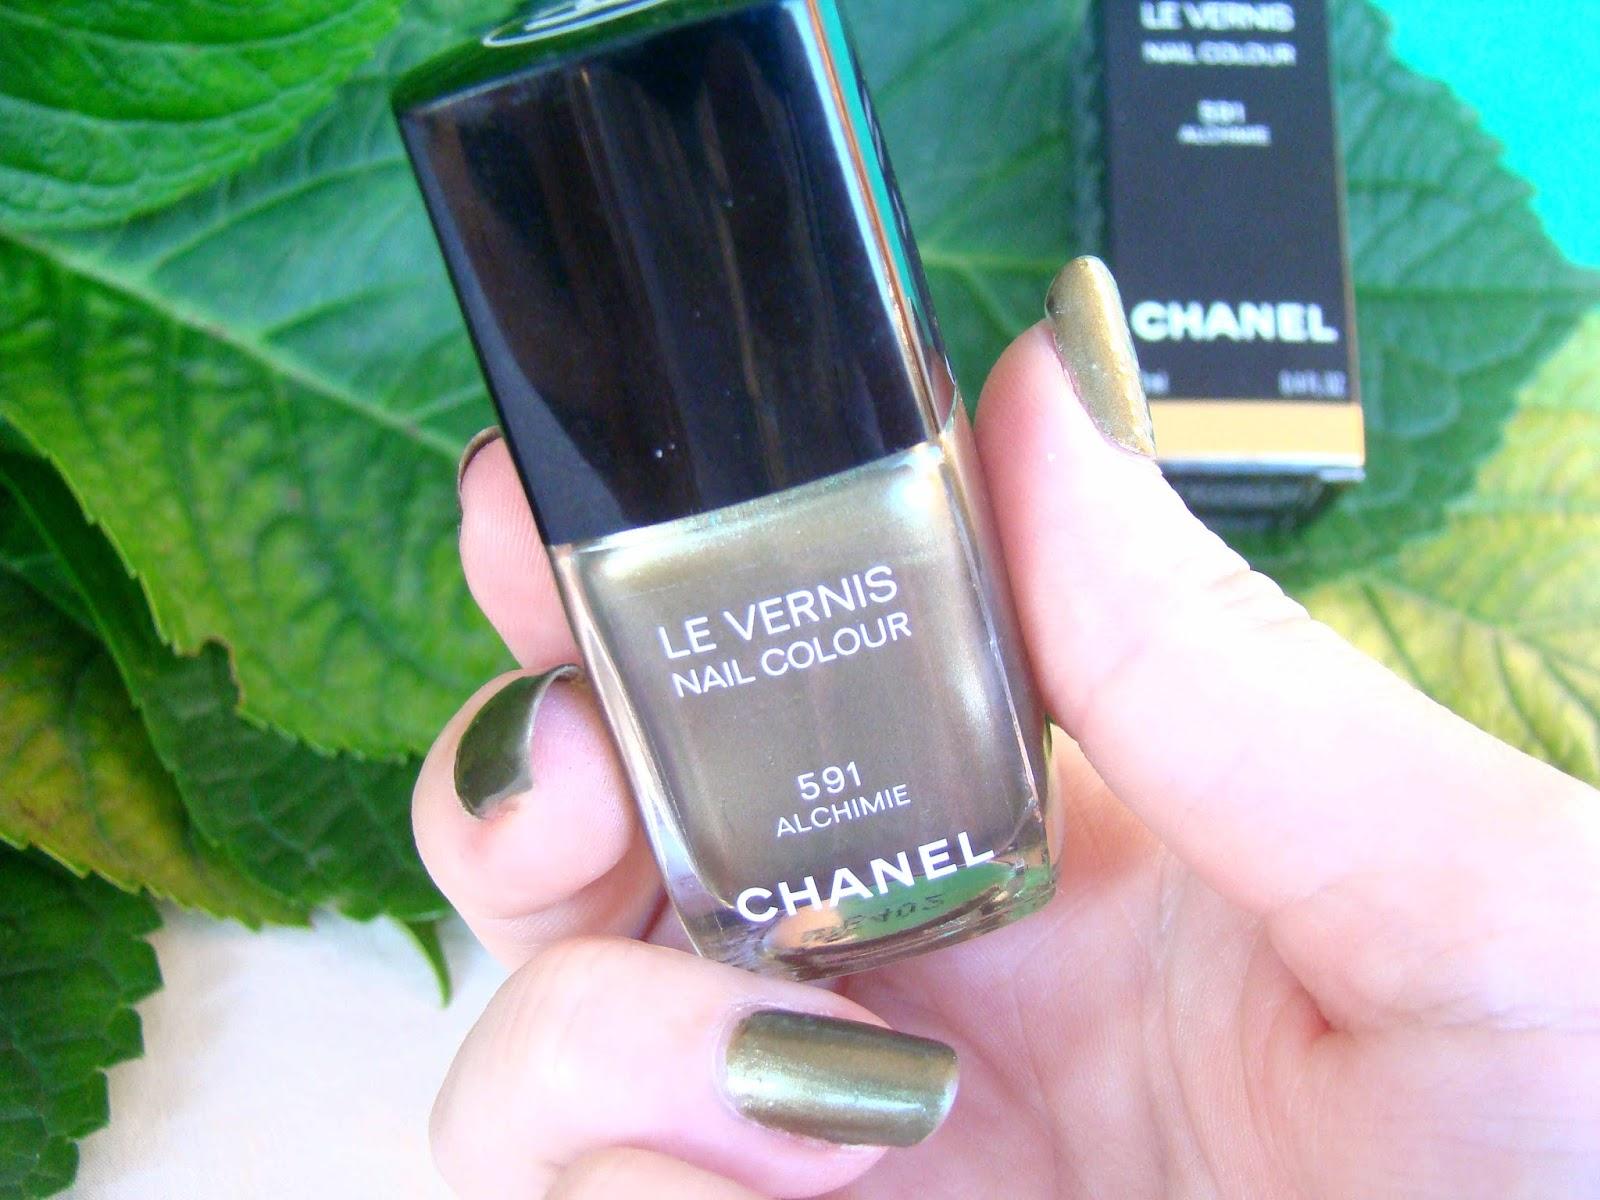 Vernis Chanel Alchimie 591